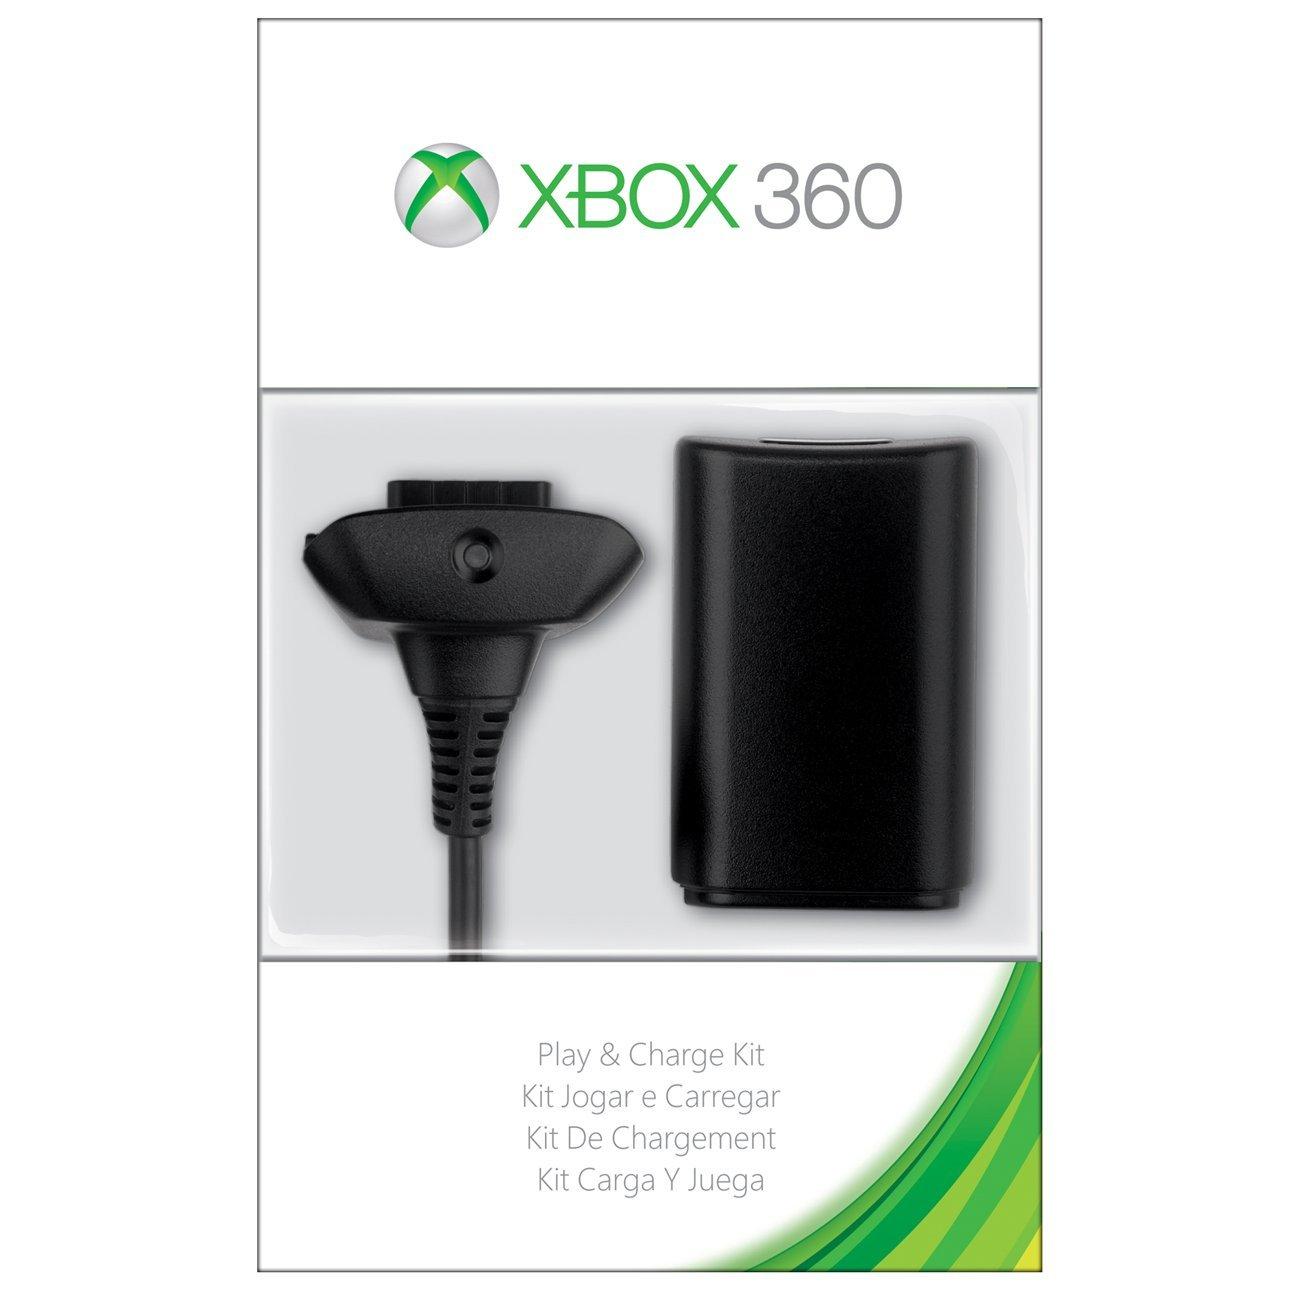 Amazon: kit carga y juega Xbox 360 a $265